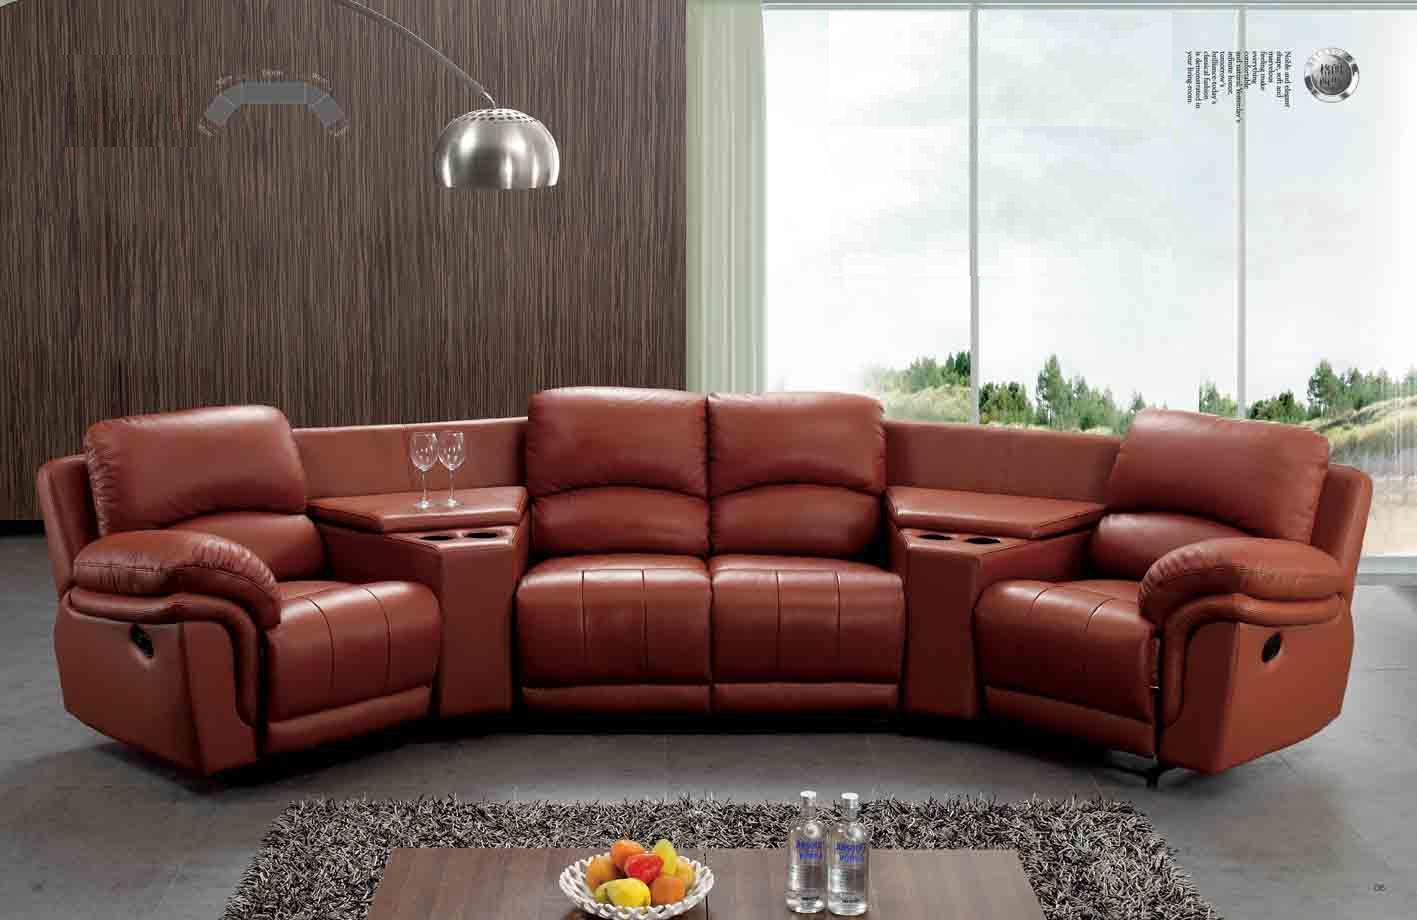 sofa sets nitaly leather recliner sofa half leather recliner sofa set